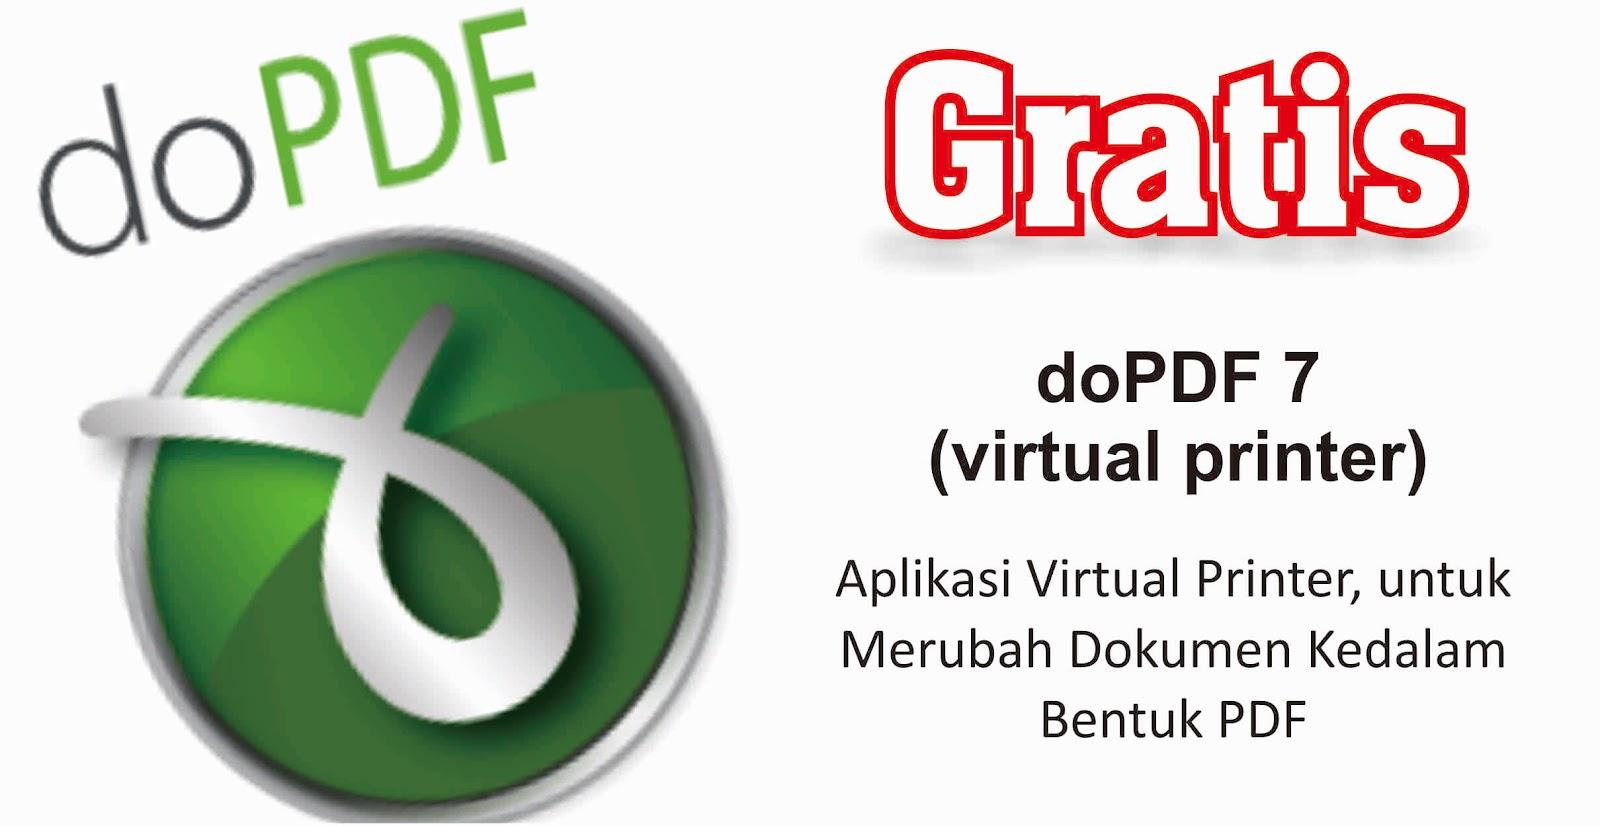 WatFile.com Download Free Download Gratis doPDF (virtual printer) - Cecep Husni Mubarok